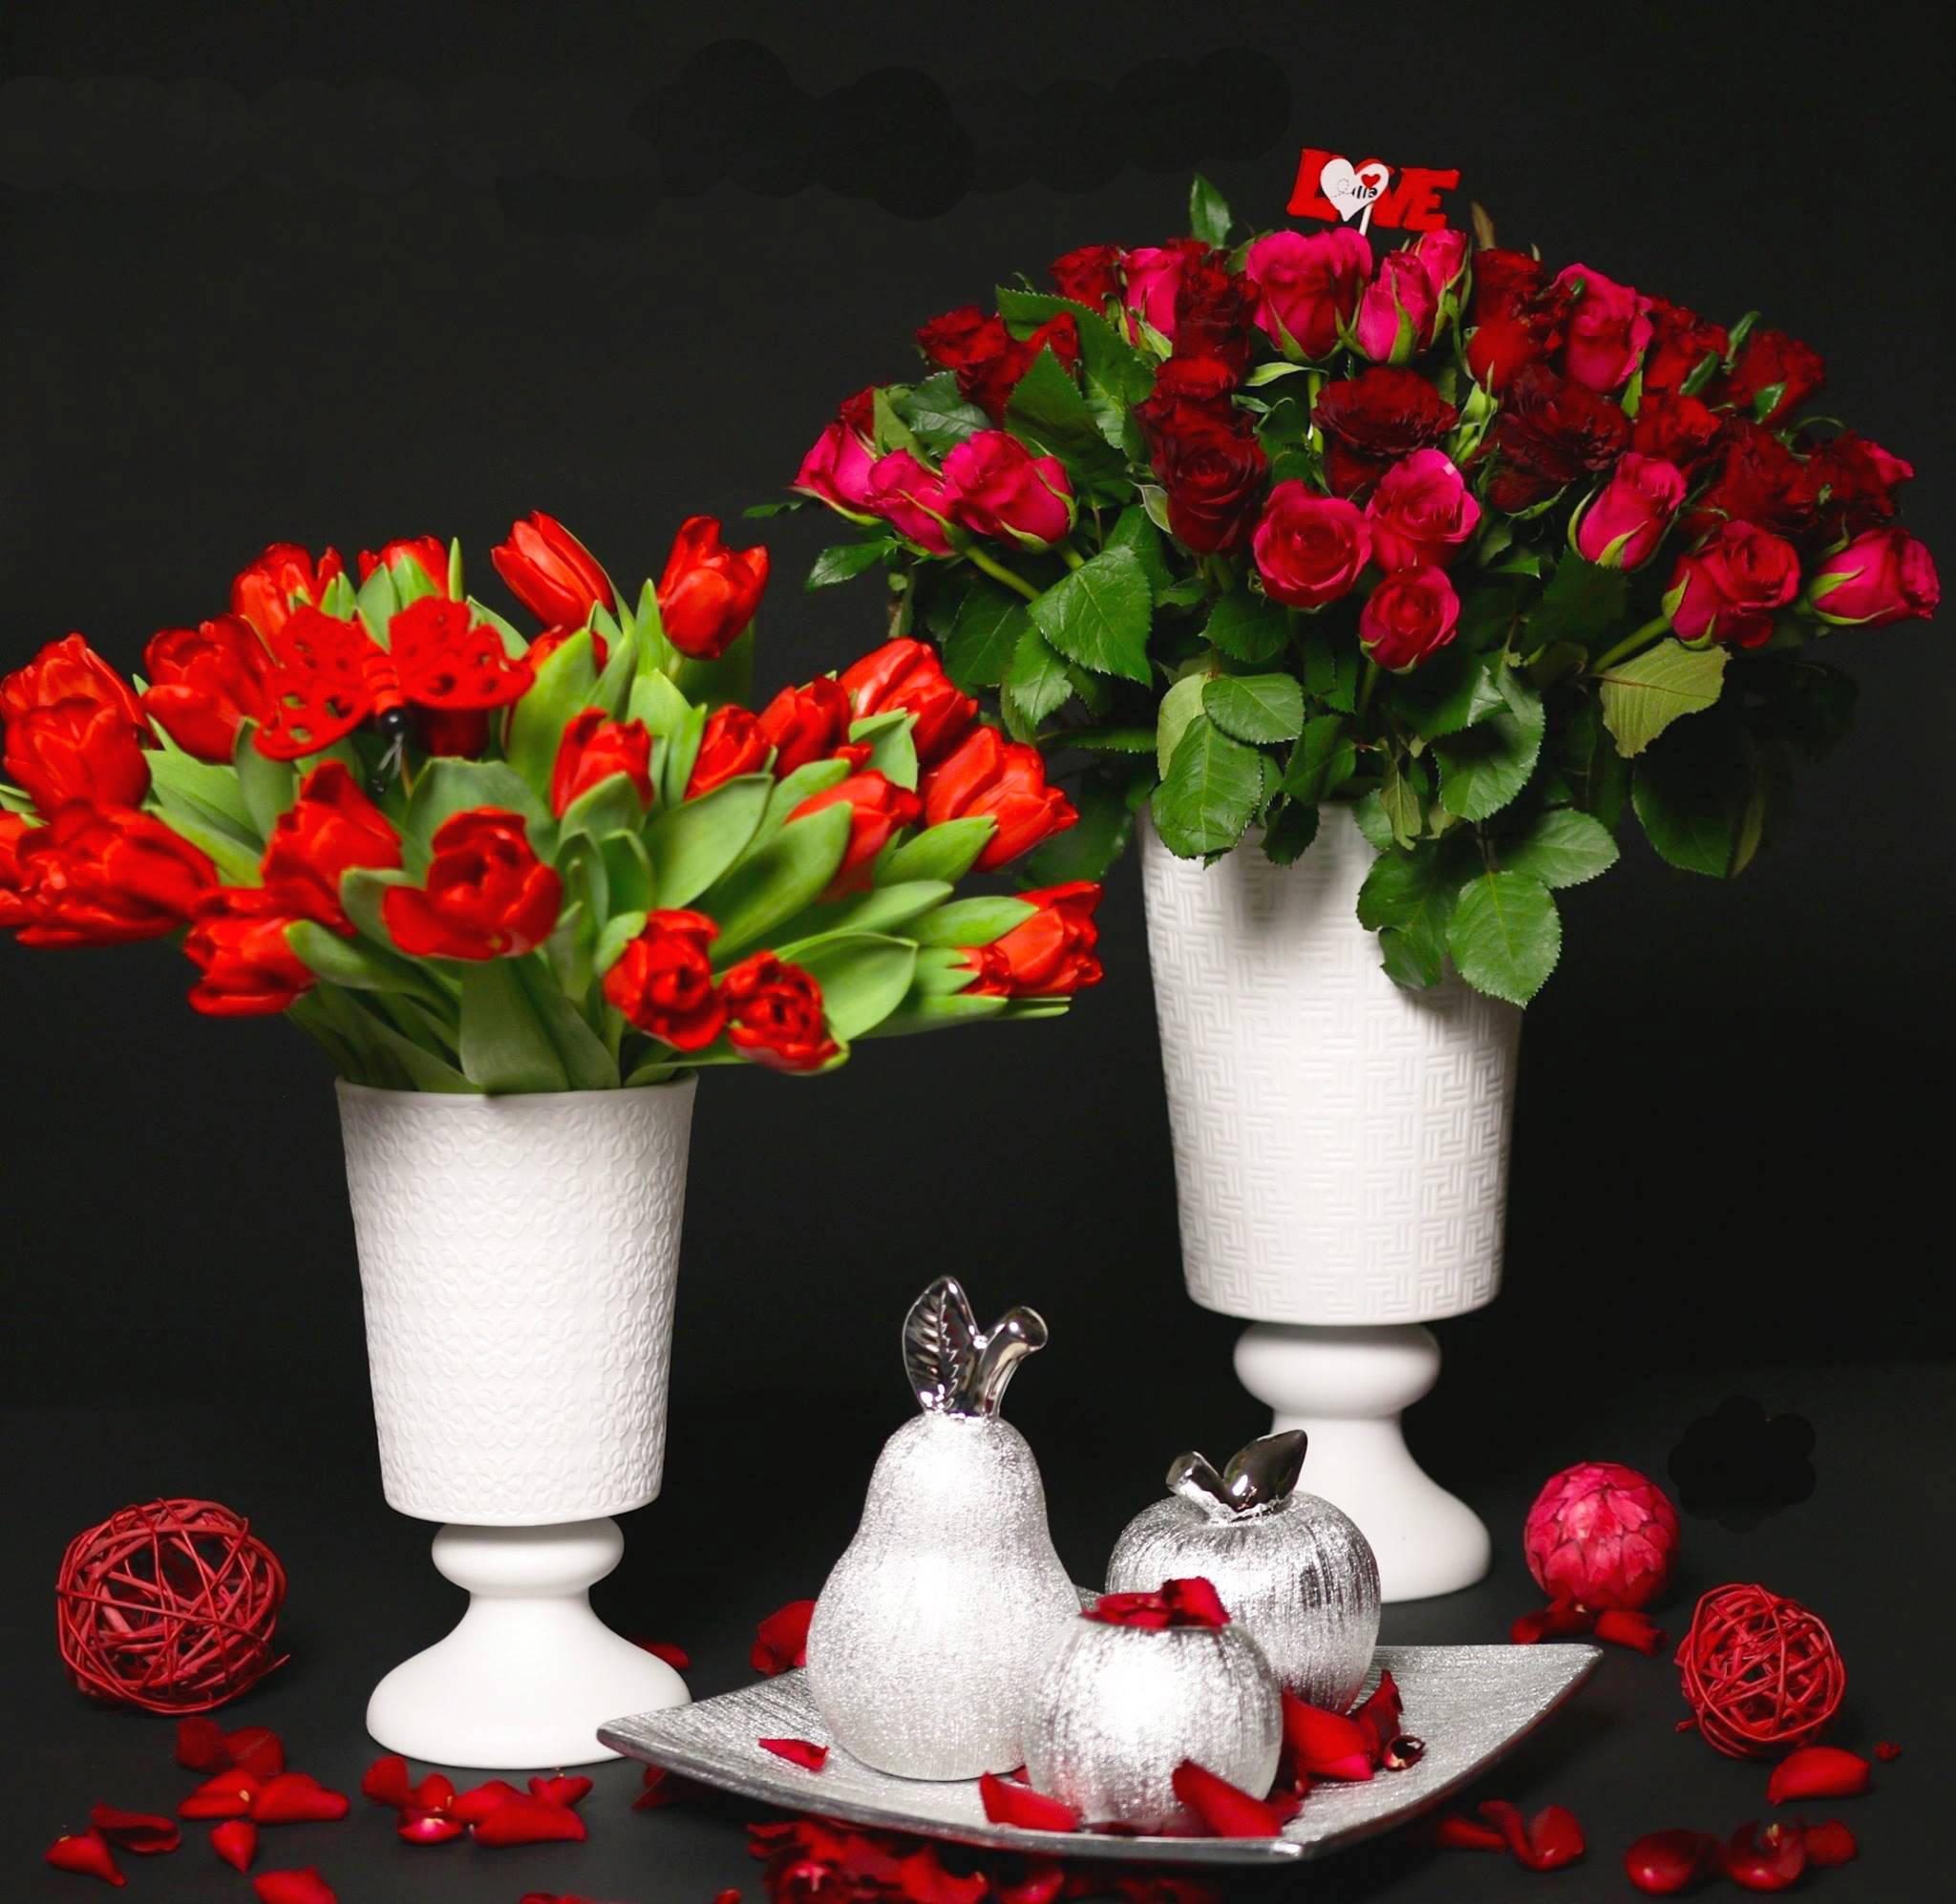 cc317e09d024630d2ee4_faba52f42758648a342f_sahola_valentines.jpg